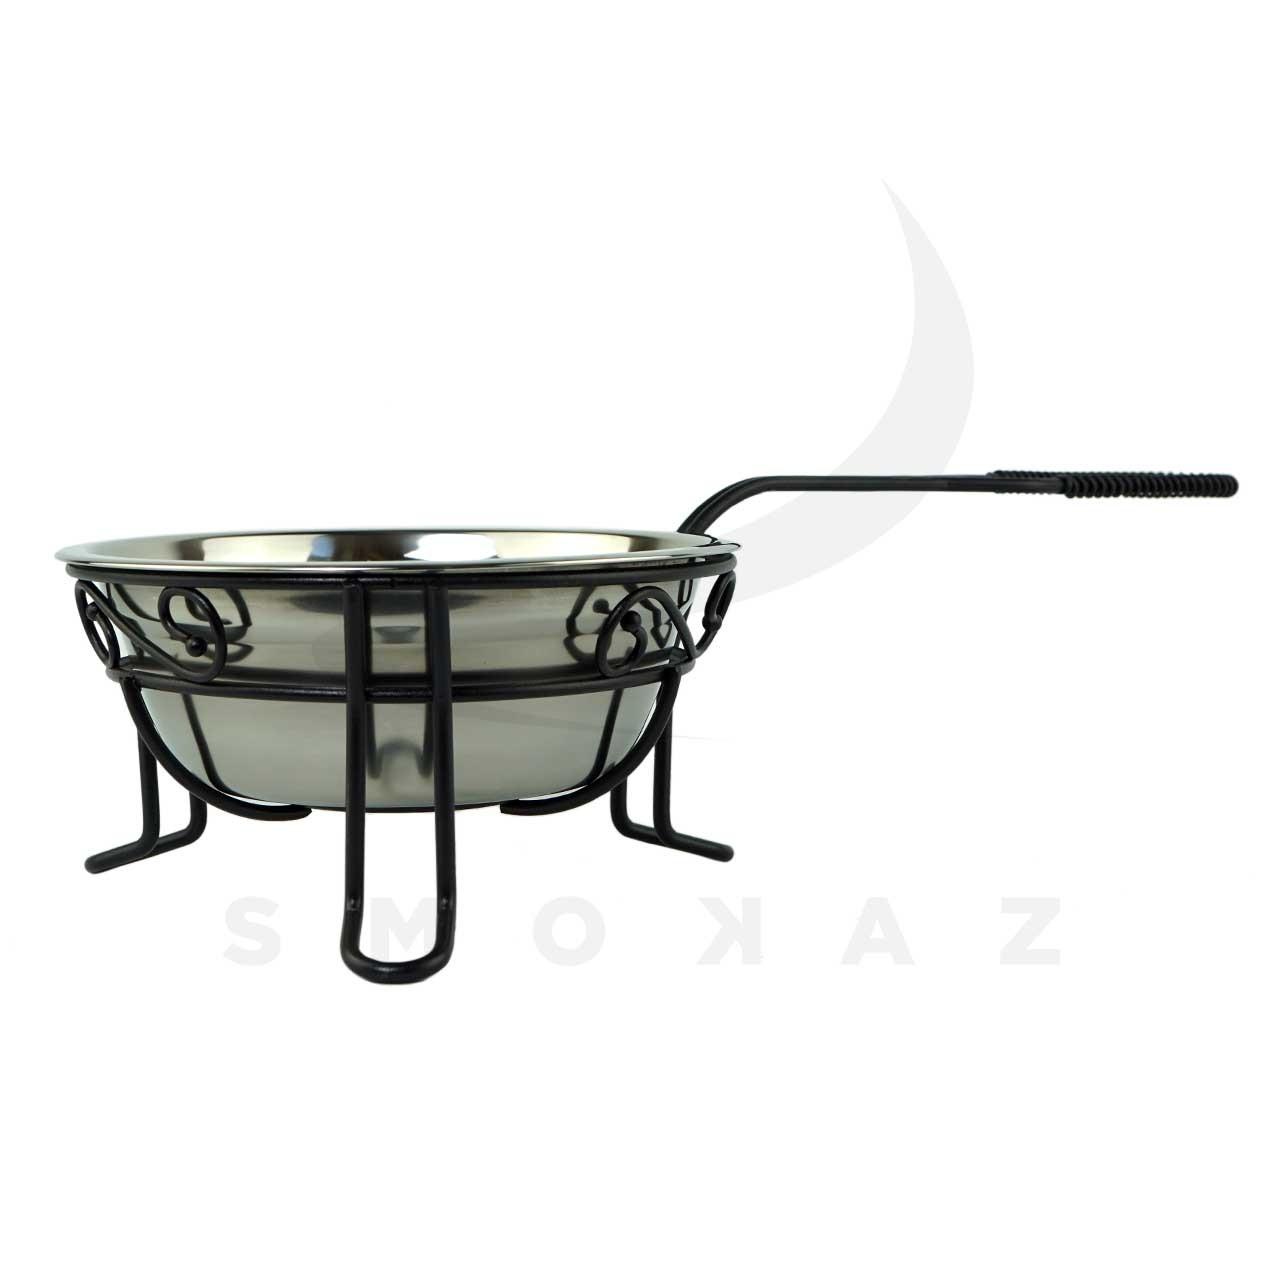 Kohletrager Kaya Flach Oriental